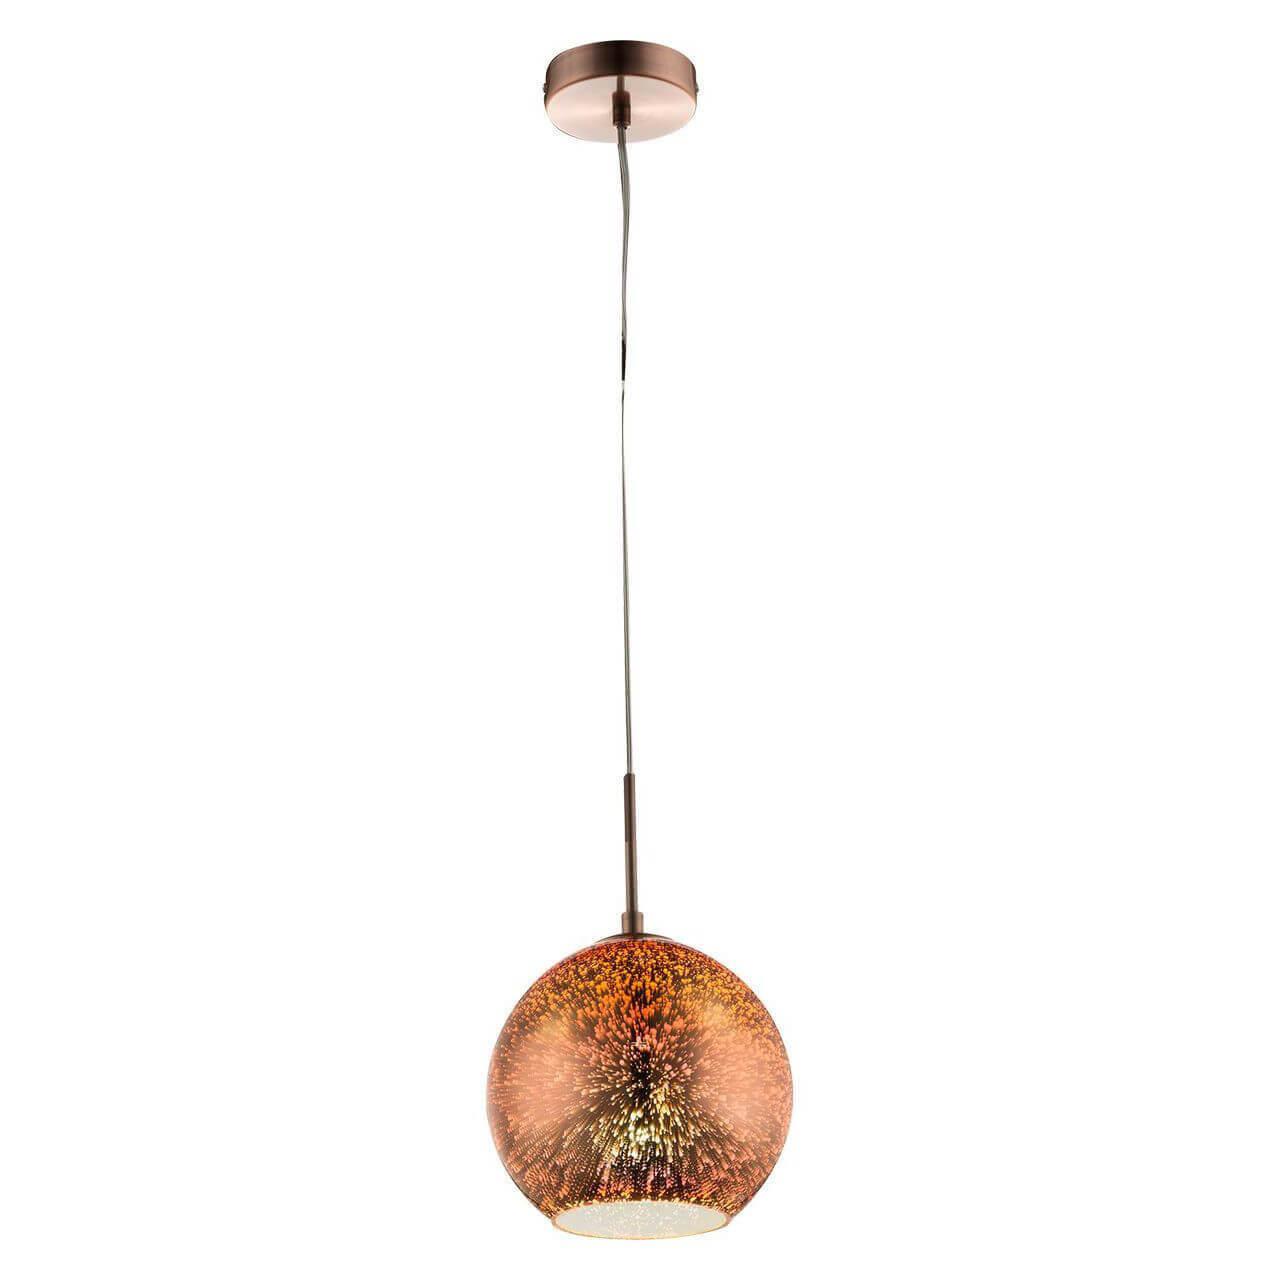 Подвесной светильник Globo Koby 15845 цена и фото